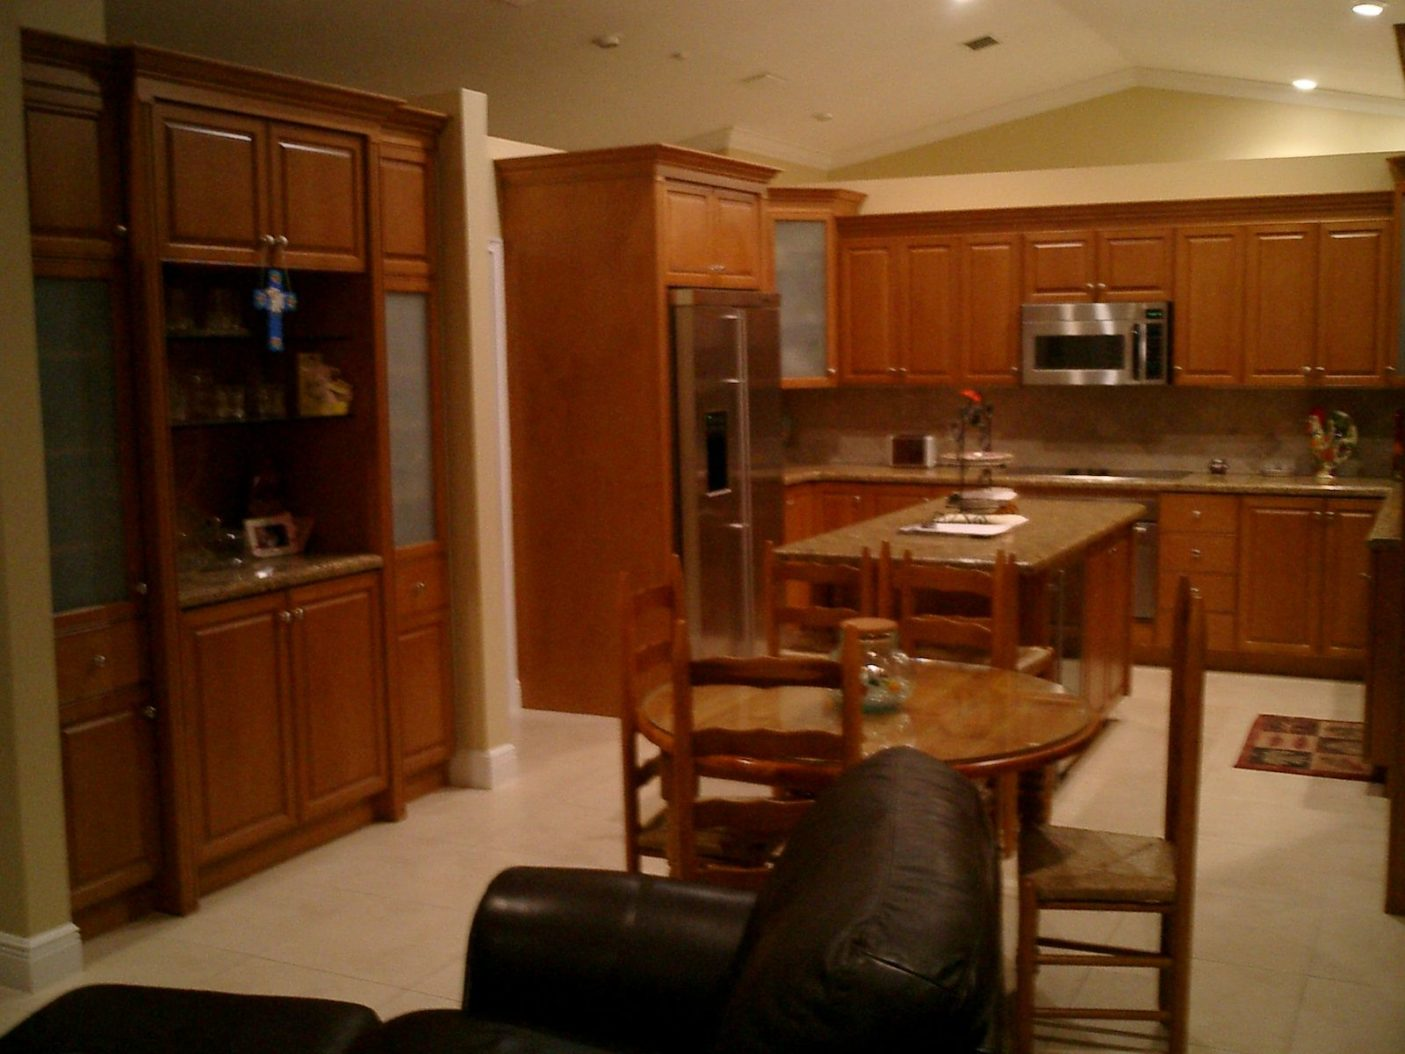 Kitchens-108.jpg